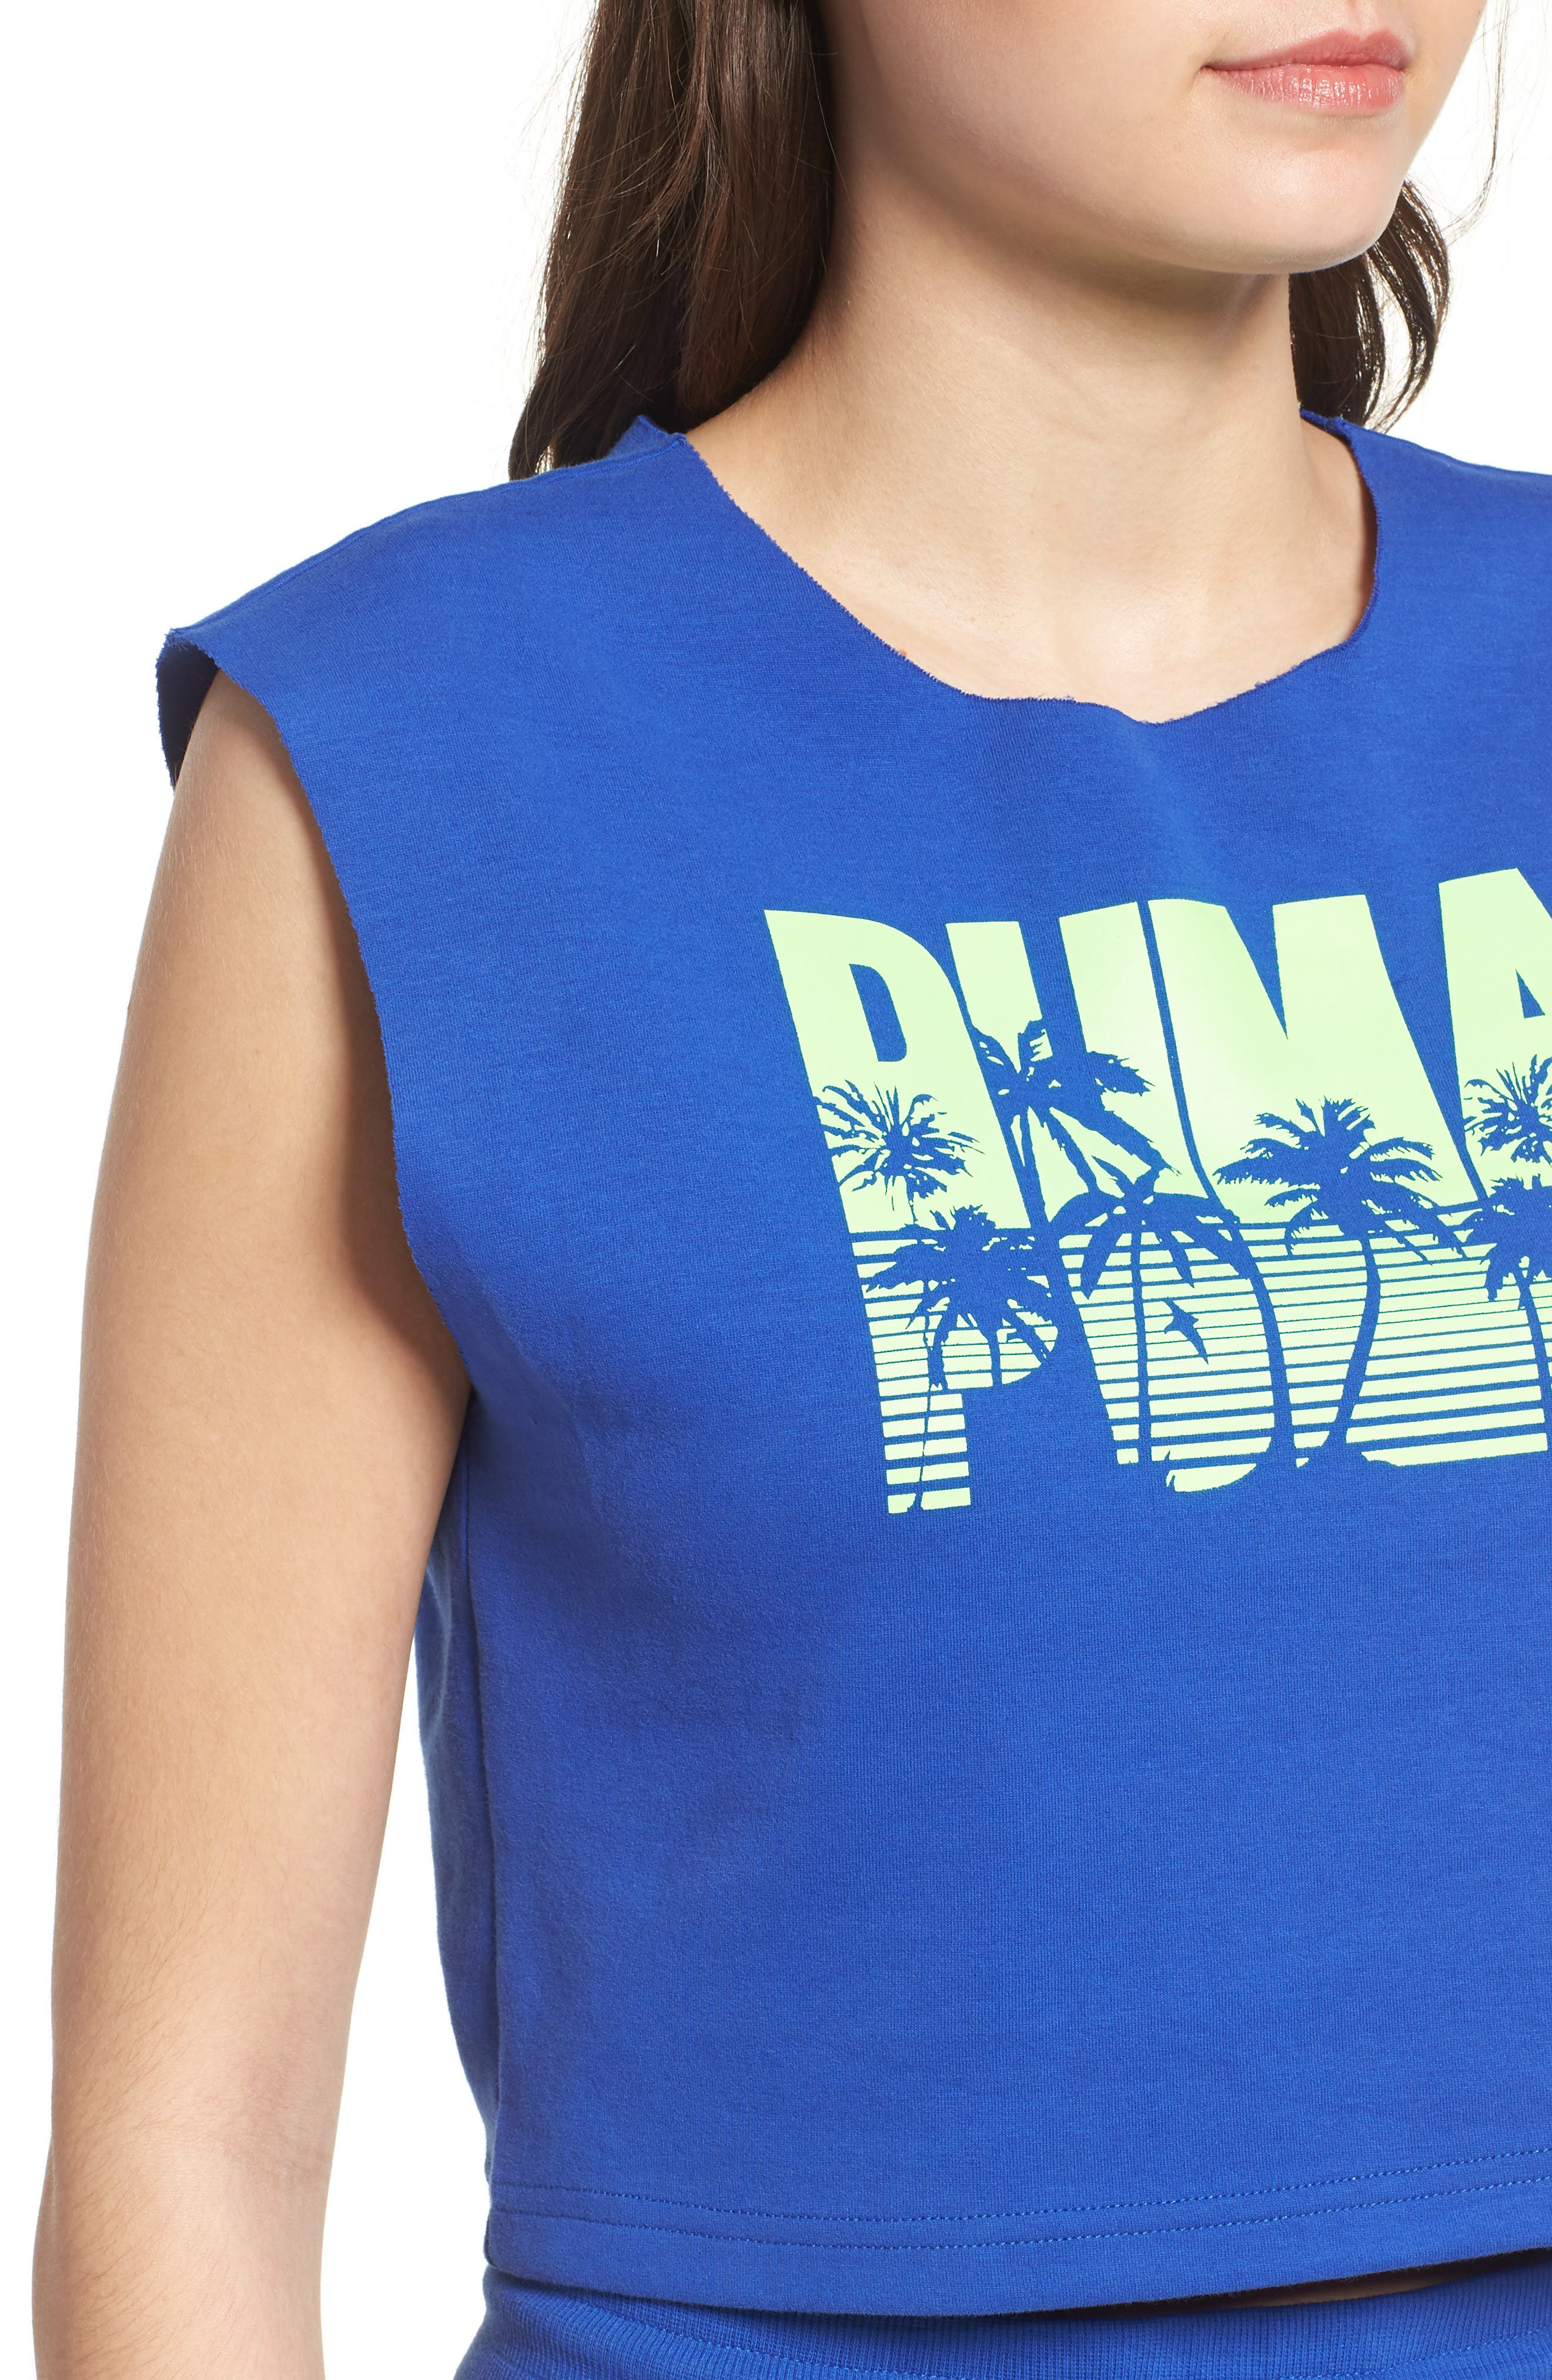 FENTY PUMA by Rihanna Logo Crop Top,                             Alternate thumbnail 4, color,                             400